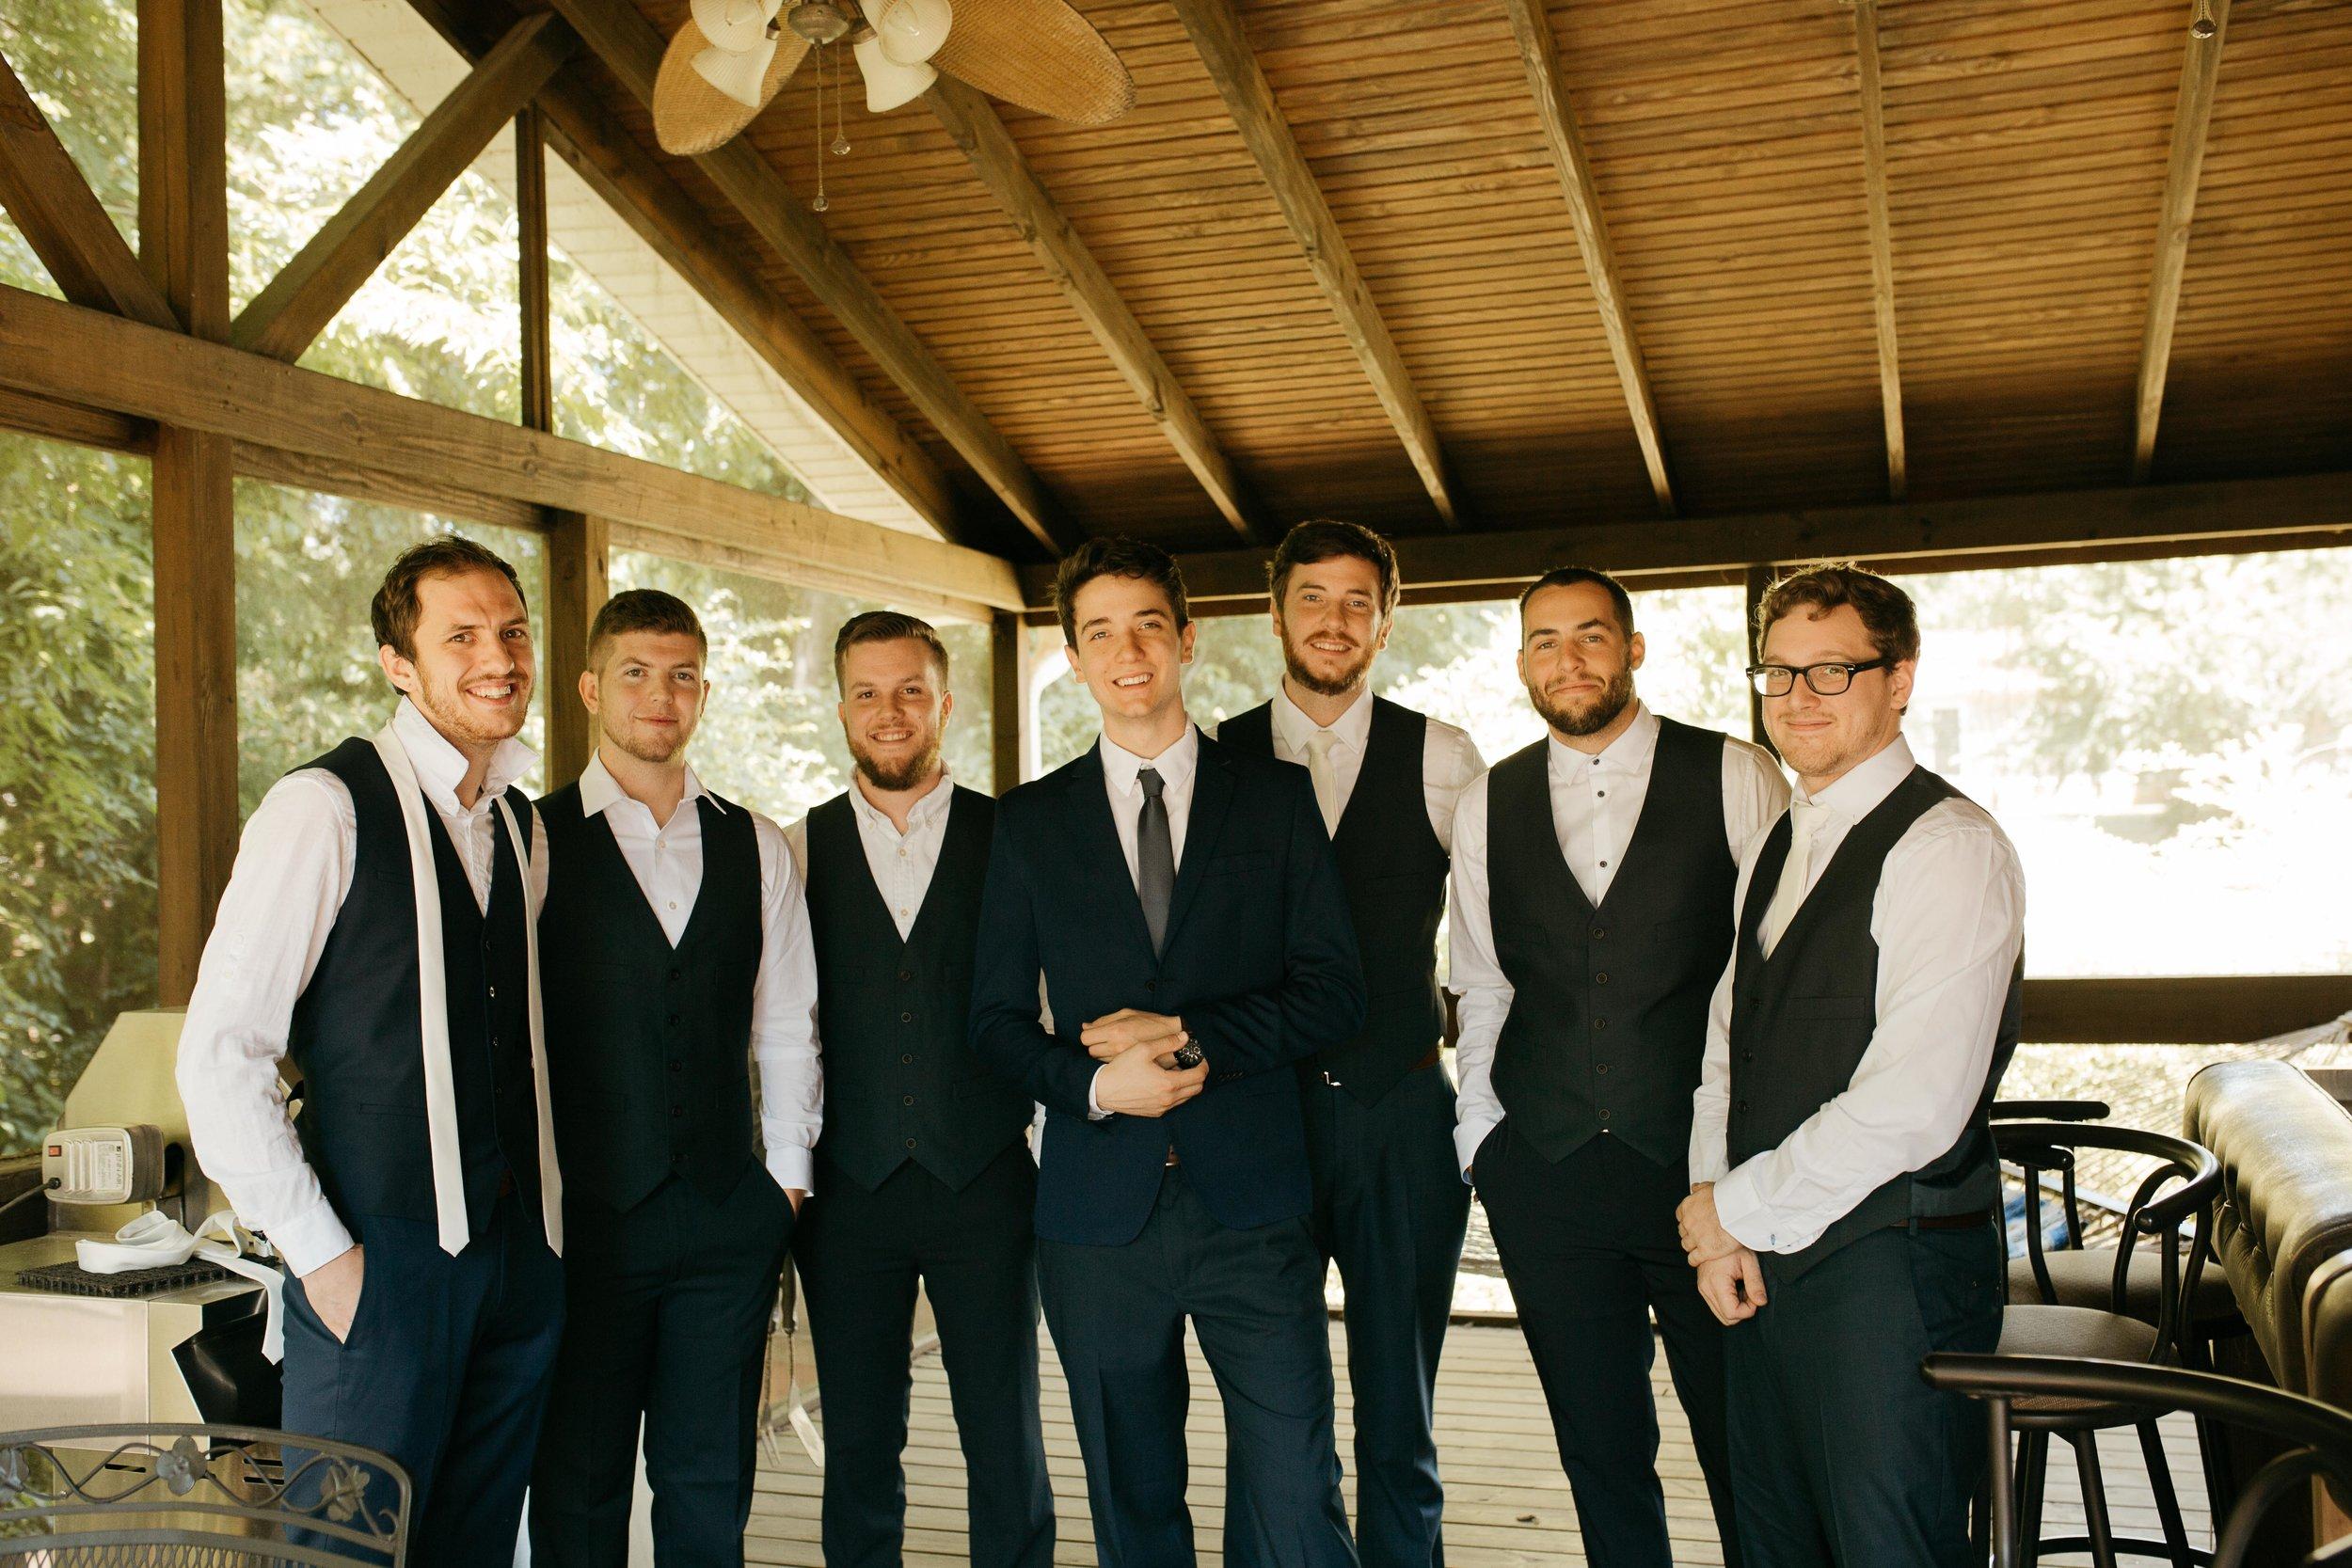 memphis tn wedding-83.jpg